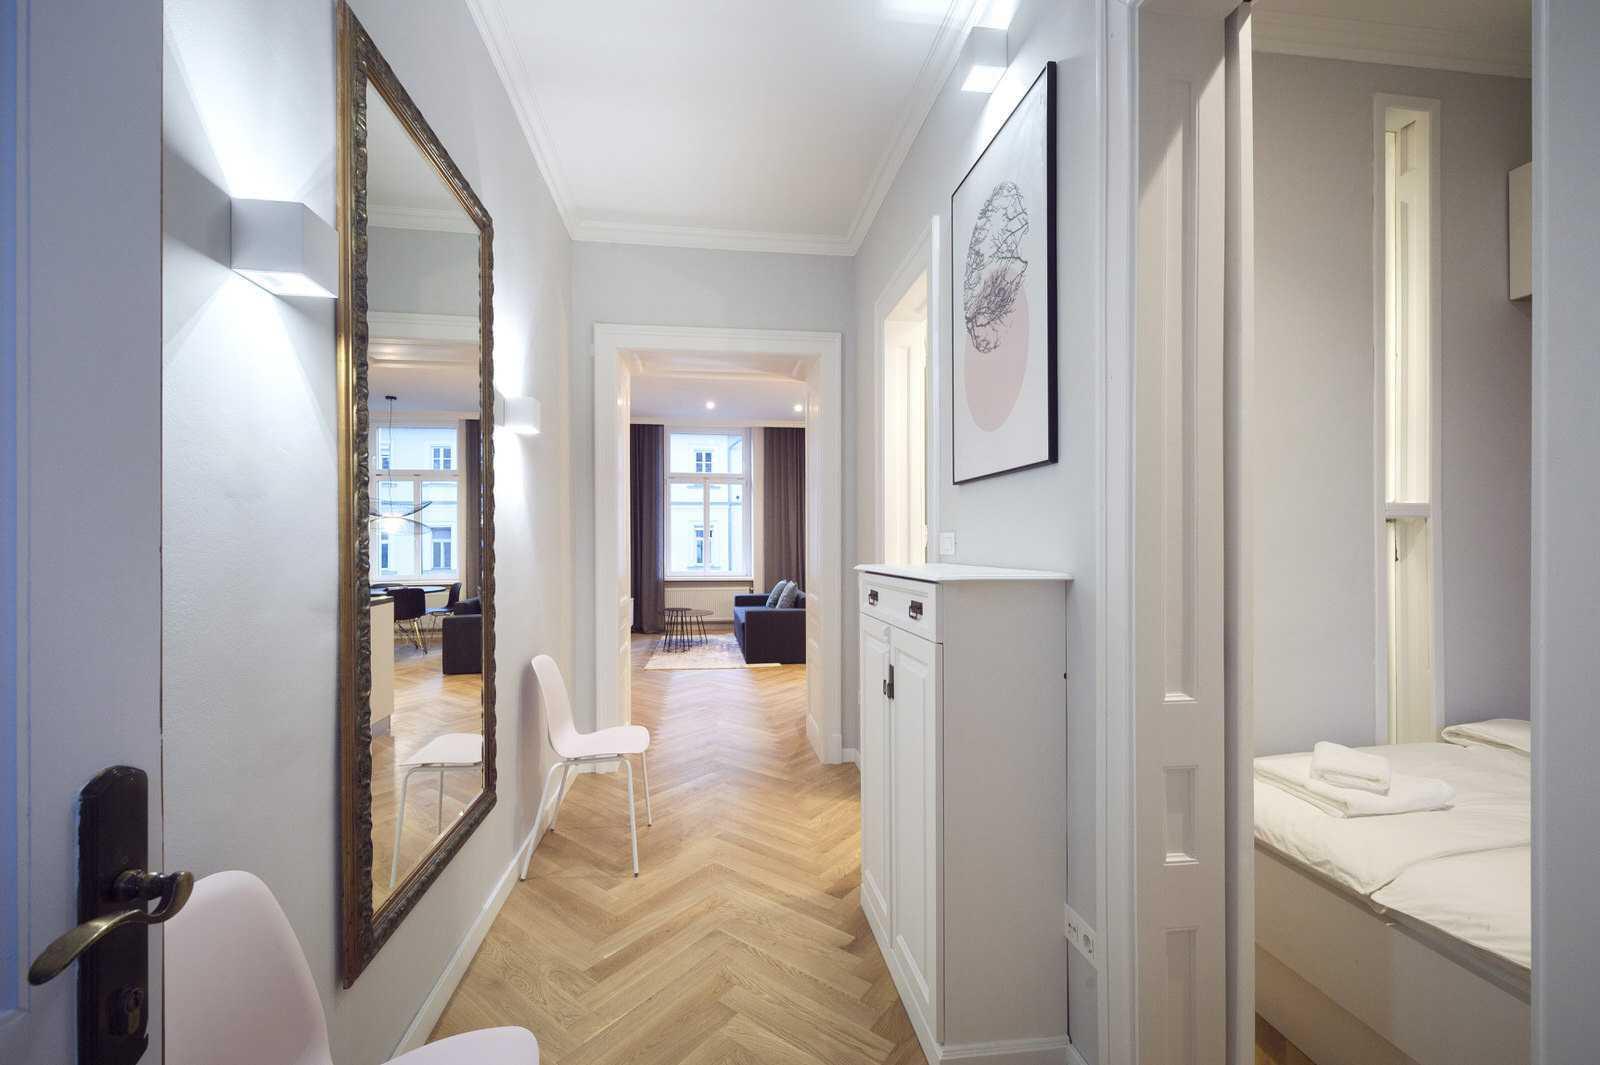 Entrance hallway of Ljubljana rental apartment